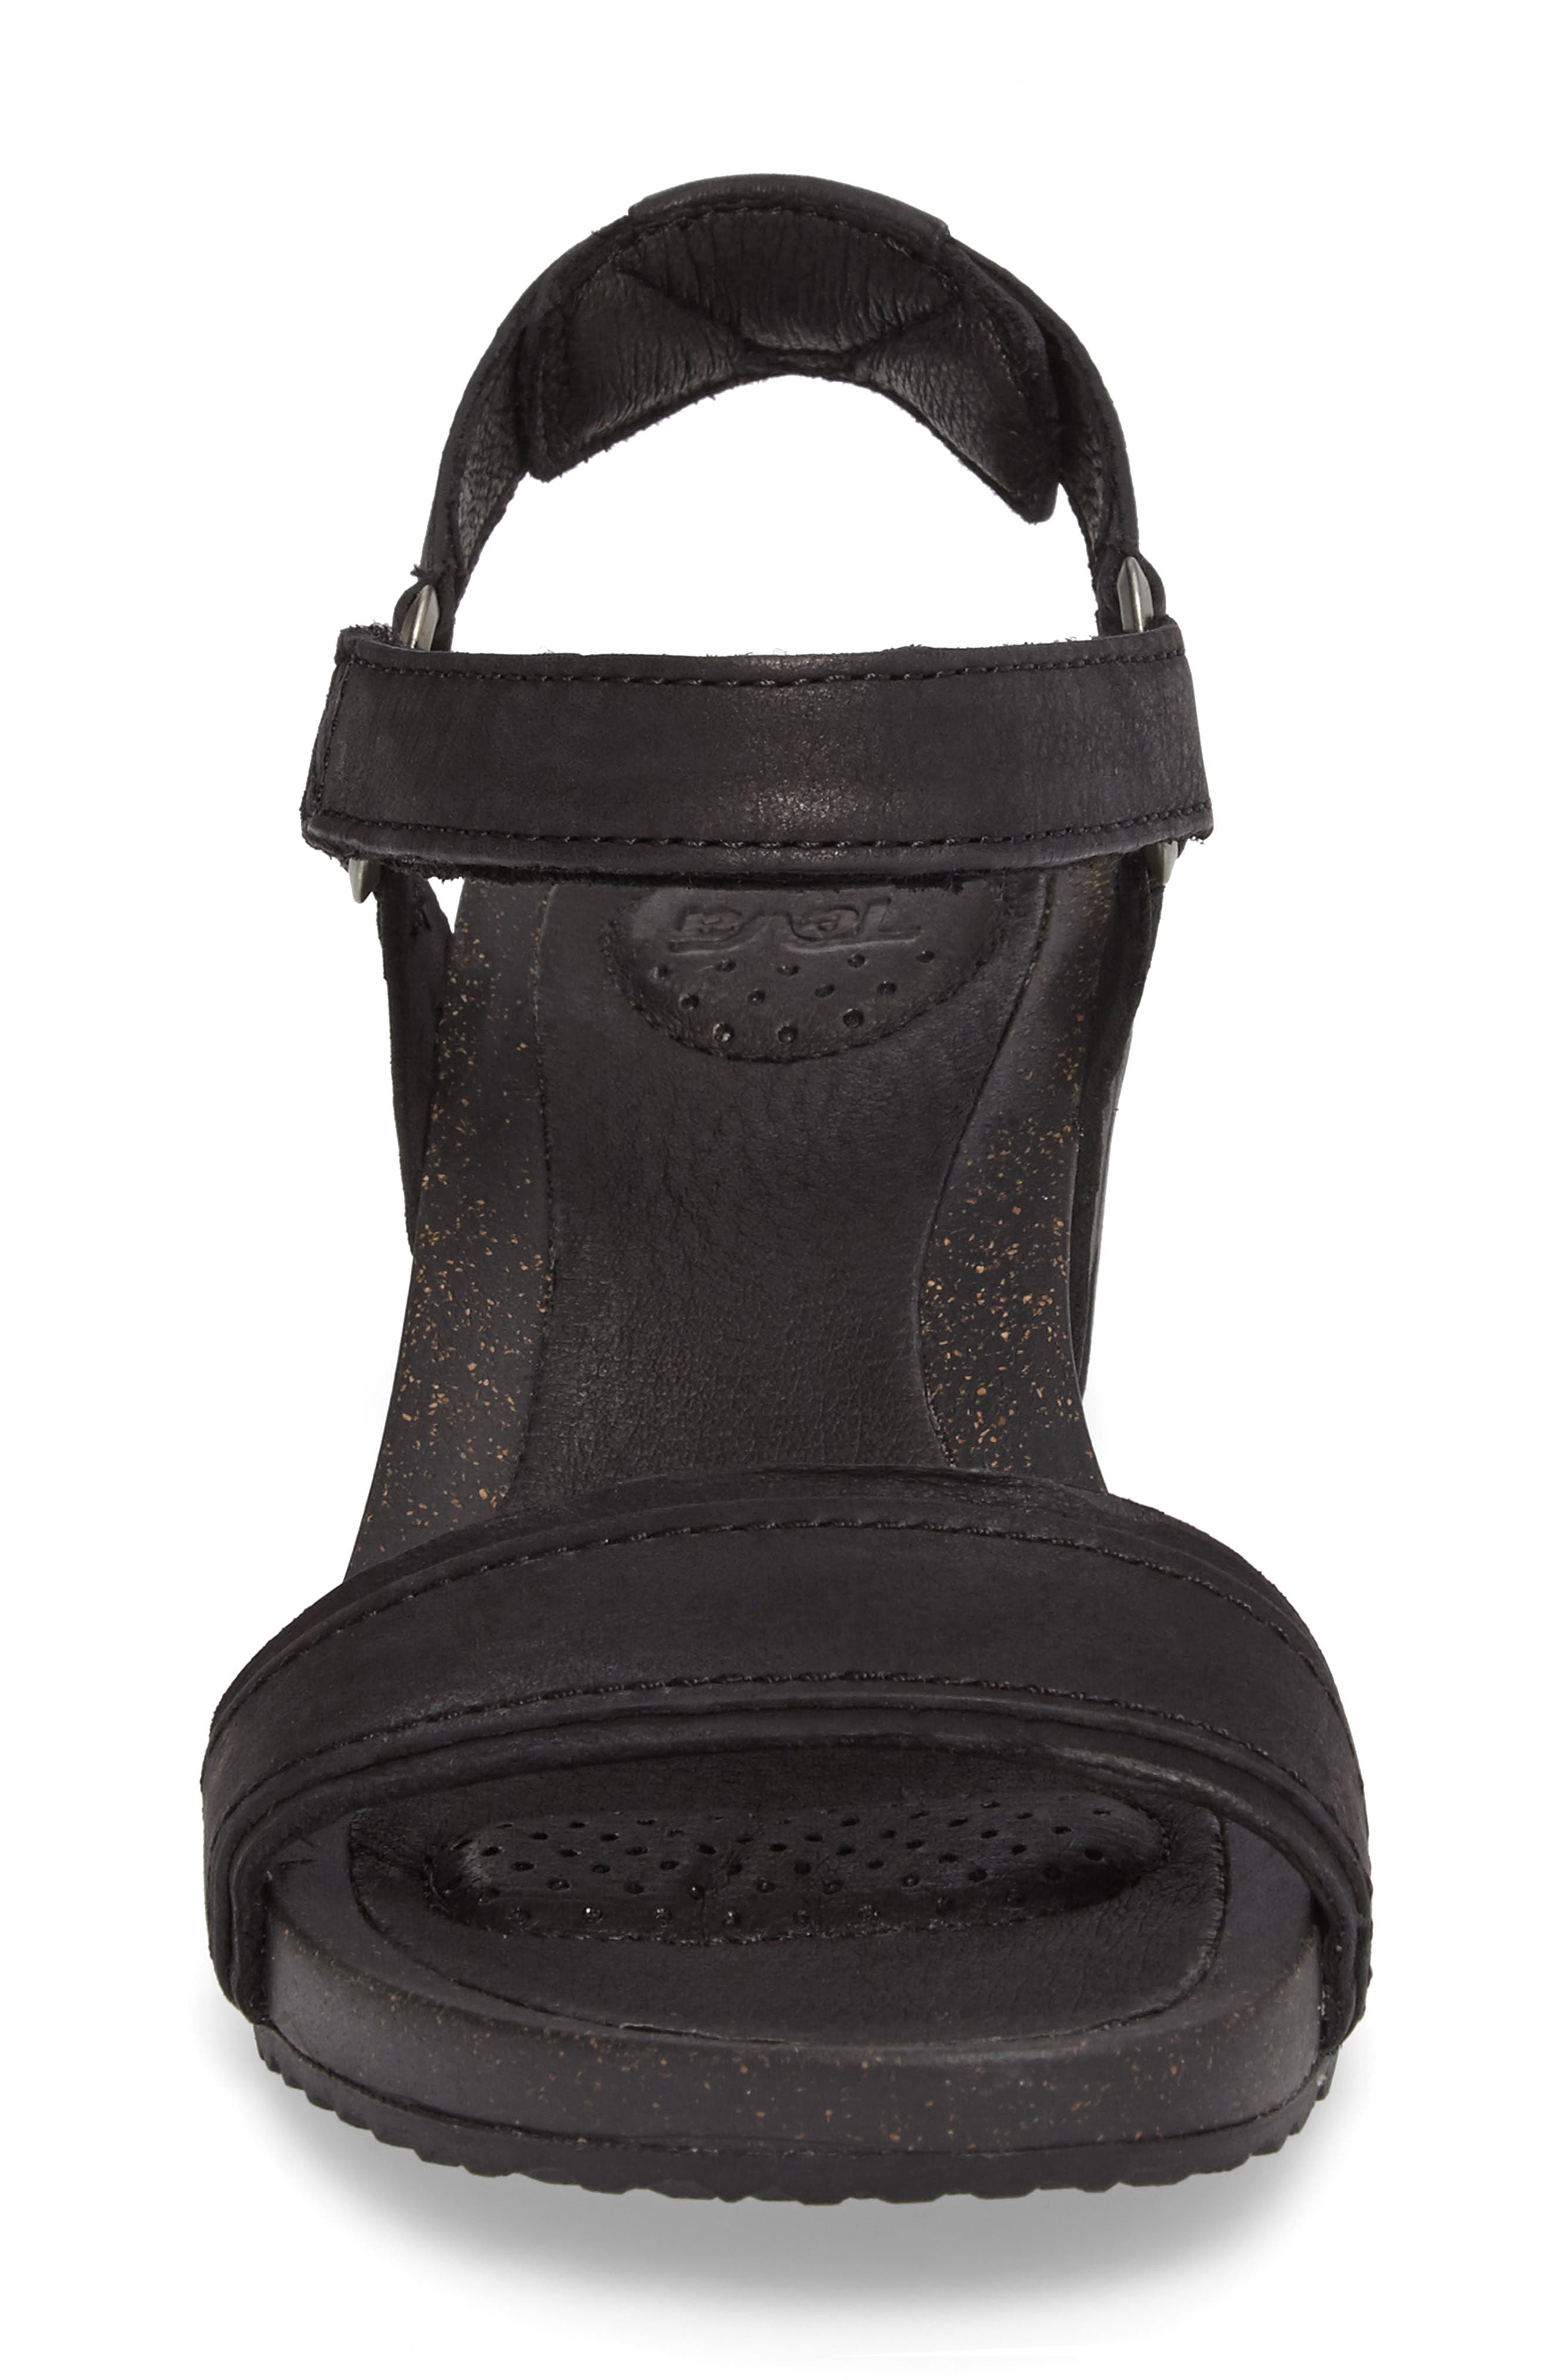 Ysidro Stitch Wedge Sandal,                             Alternate thumbnail 4, color,                             Black Leather